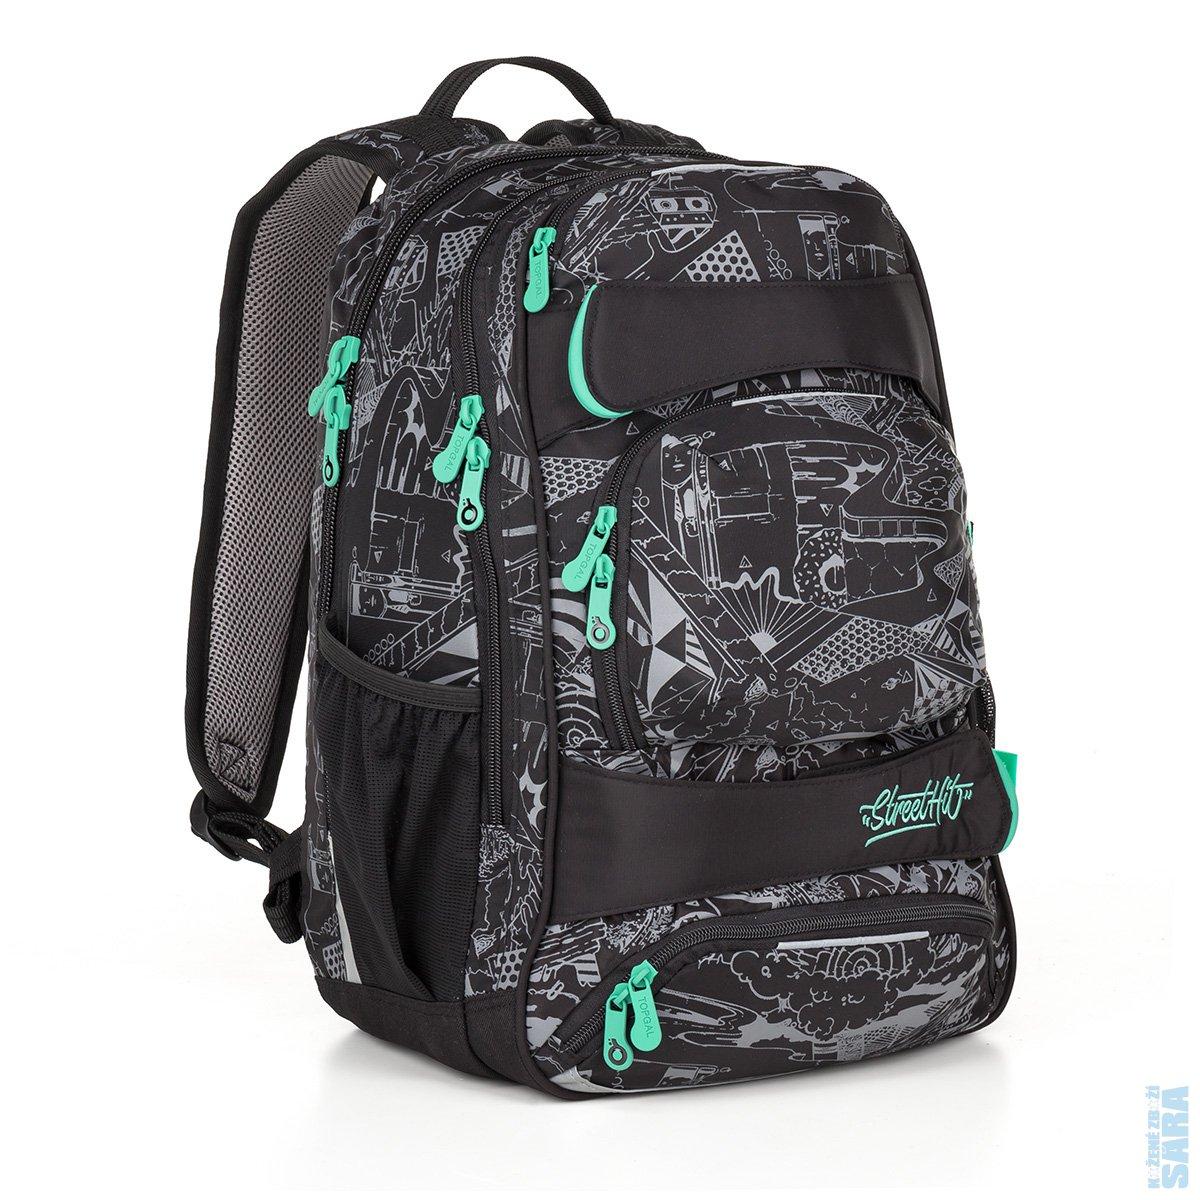 Studentský batoh YUMI 18028 B + doprava zdarma 392fe0c006